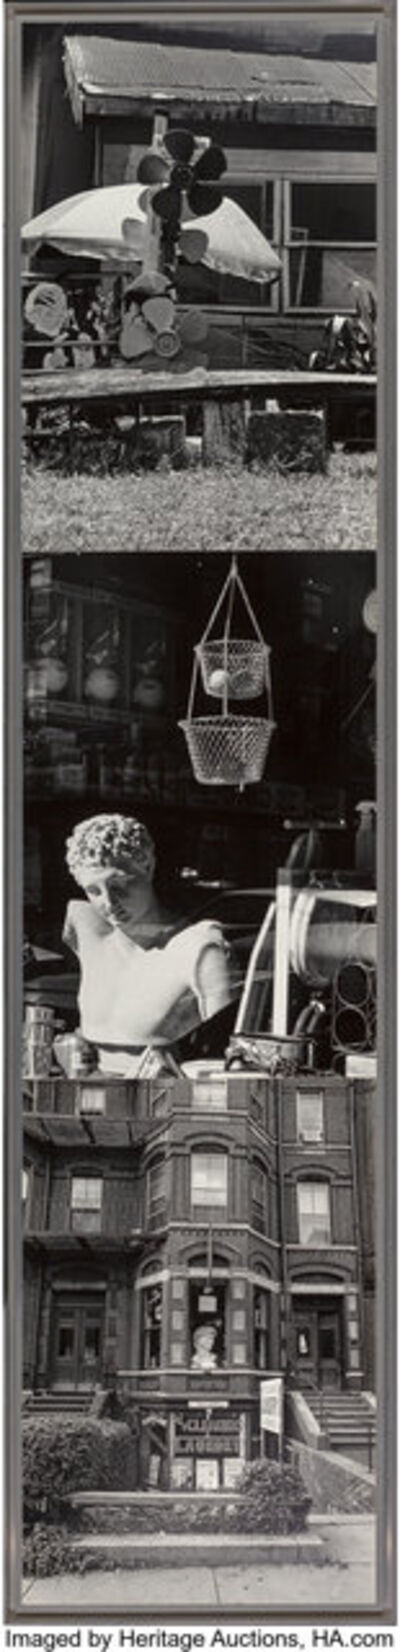 Robert Rauschenberg, 'Photem Series I, #17', 1991